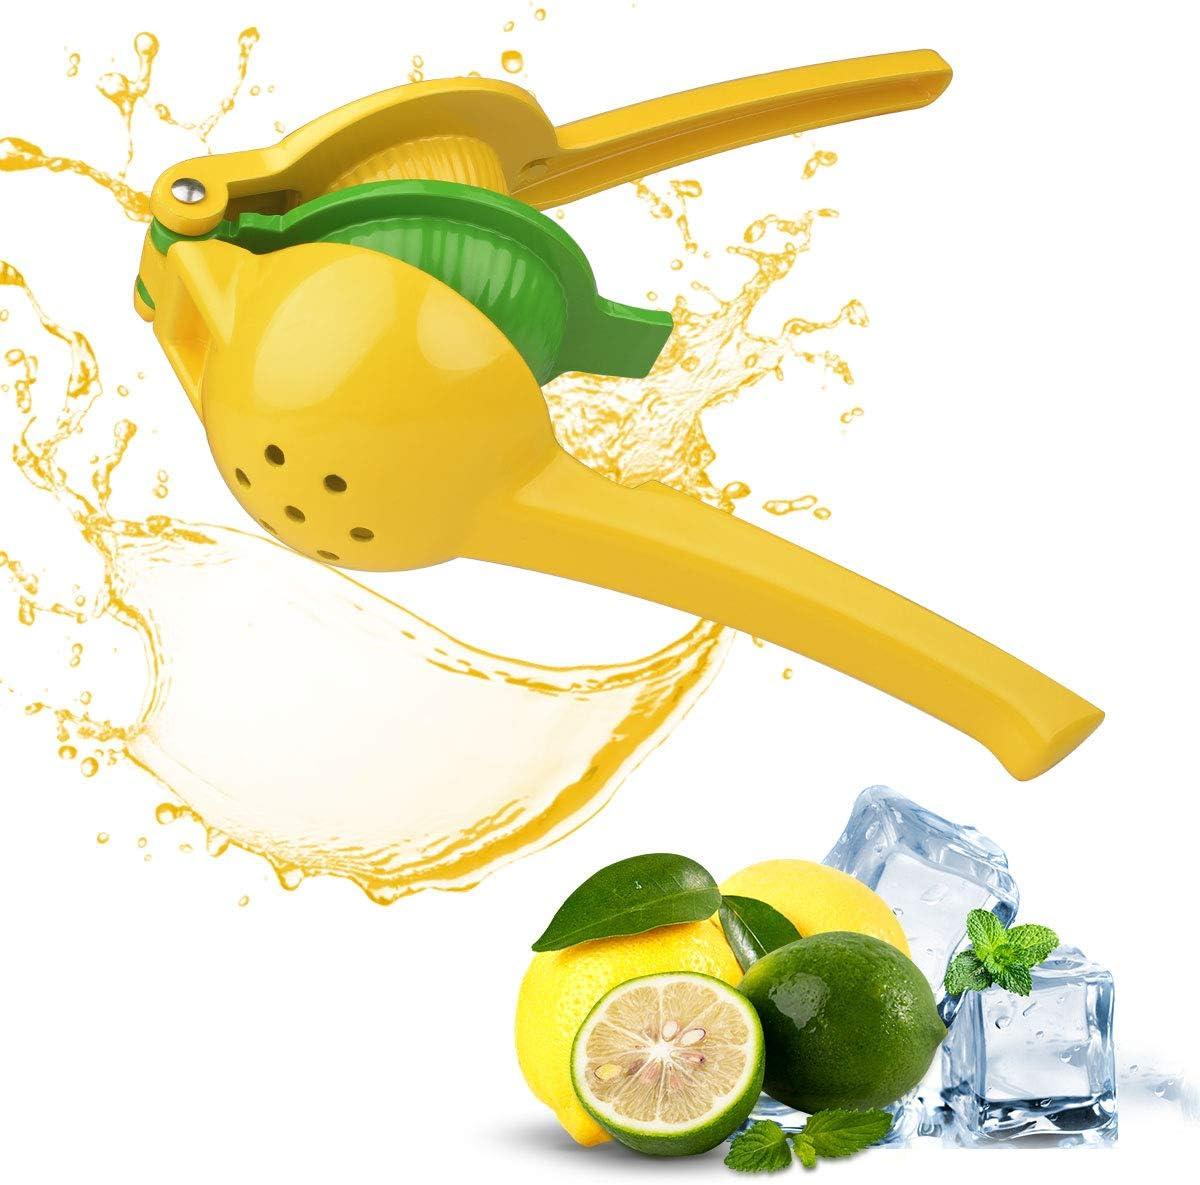 Lemon Squeezer Citrus Juicer Press Premium 2-in-1 Hand Lime Squeezer Quality Aluminum Alloy Manual Fruit Juicer Durable, Efficient Extraction (Yellow)